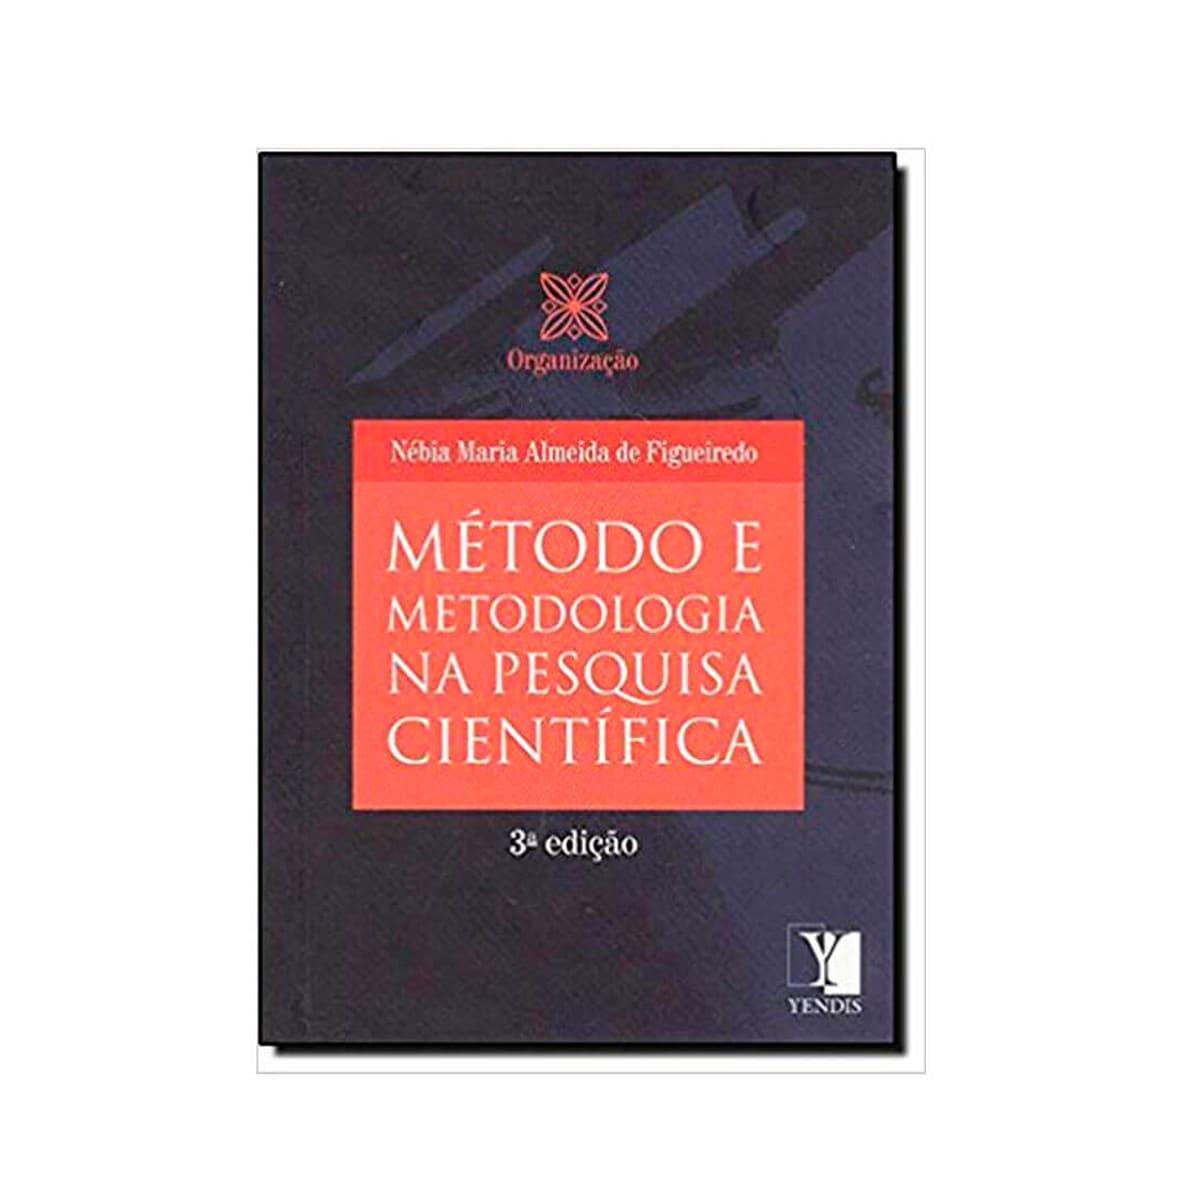 Livro - Metodo e metodologia na pesquisa cientifica